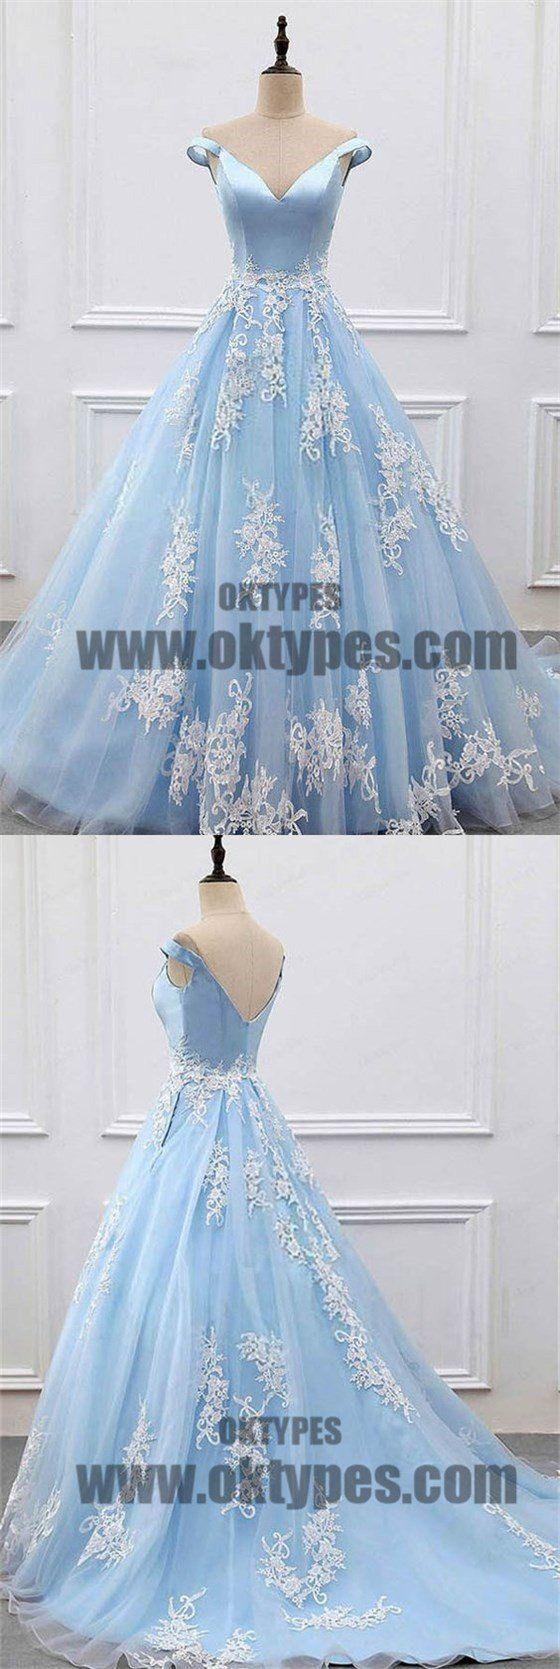 Charming light blue top satin off the shoulder aline long prom